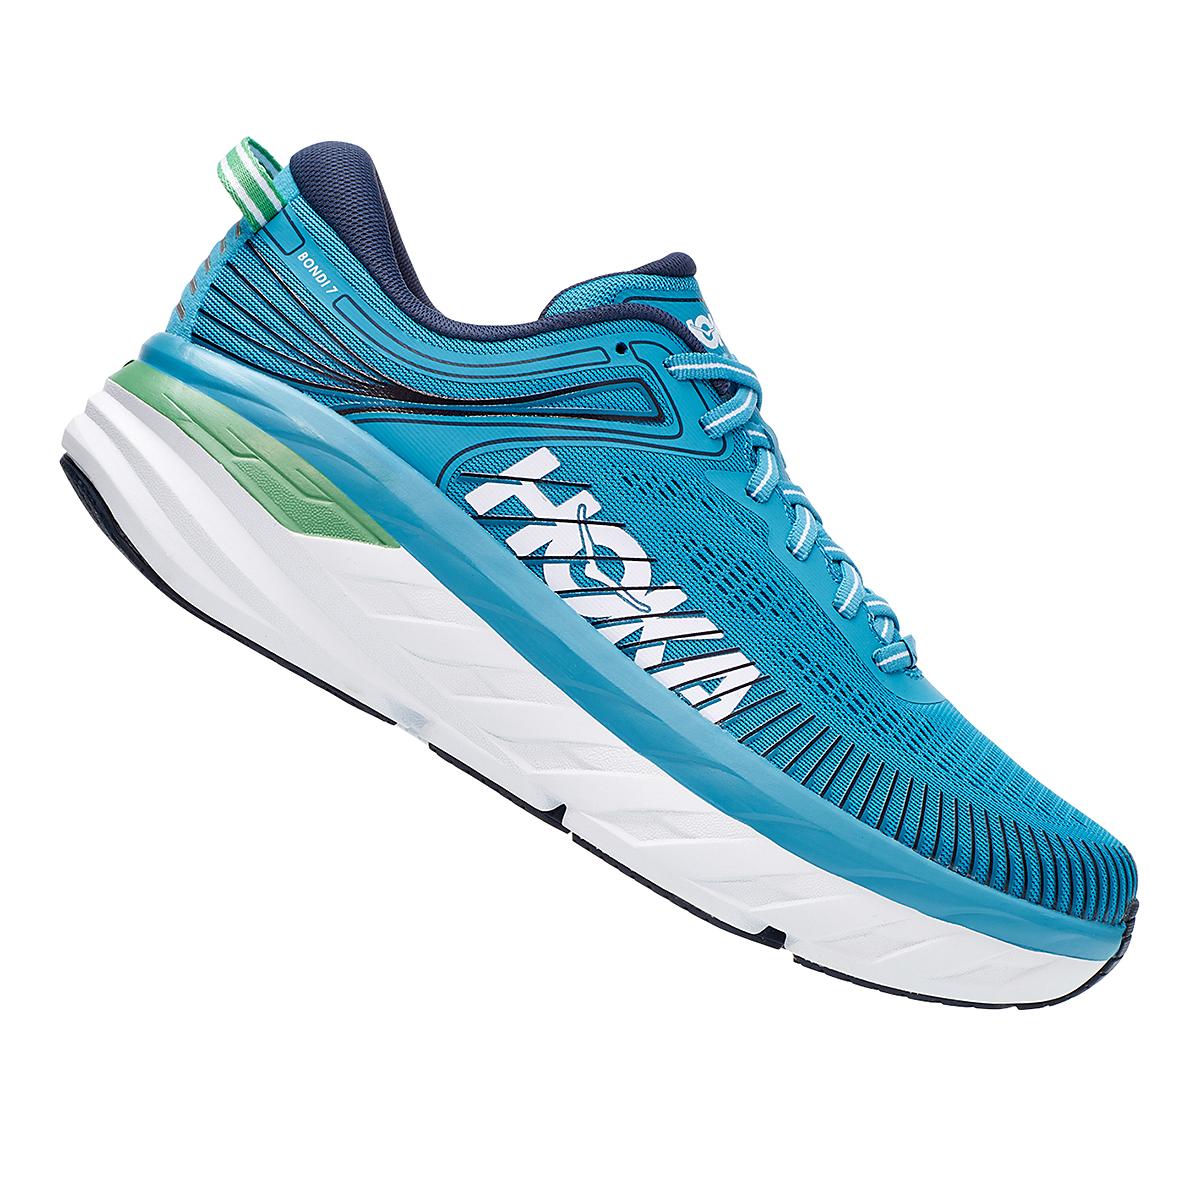 Men's Hoka One One Bondi 7 Running Shoe - Color: Blue Moon/Moonlit Ocean - Size: 7 - Width: Regular, Blue Moon/Moonlit Ocean, large, image 4